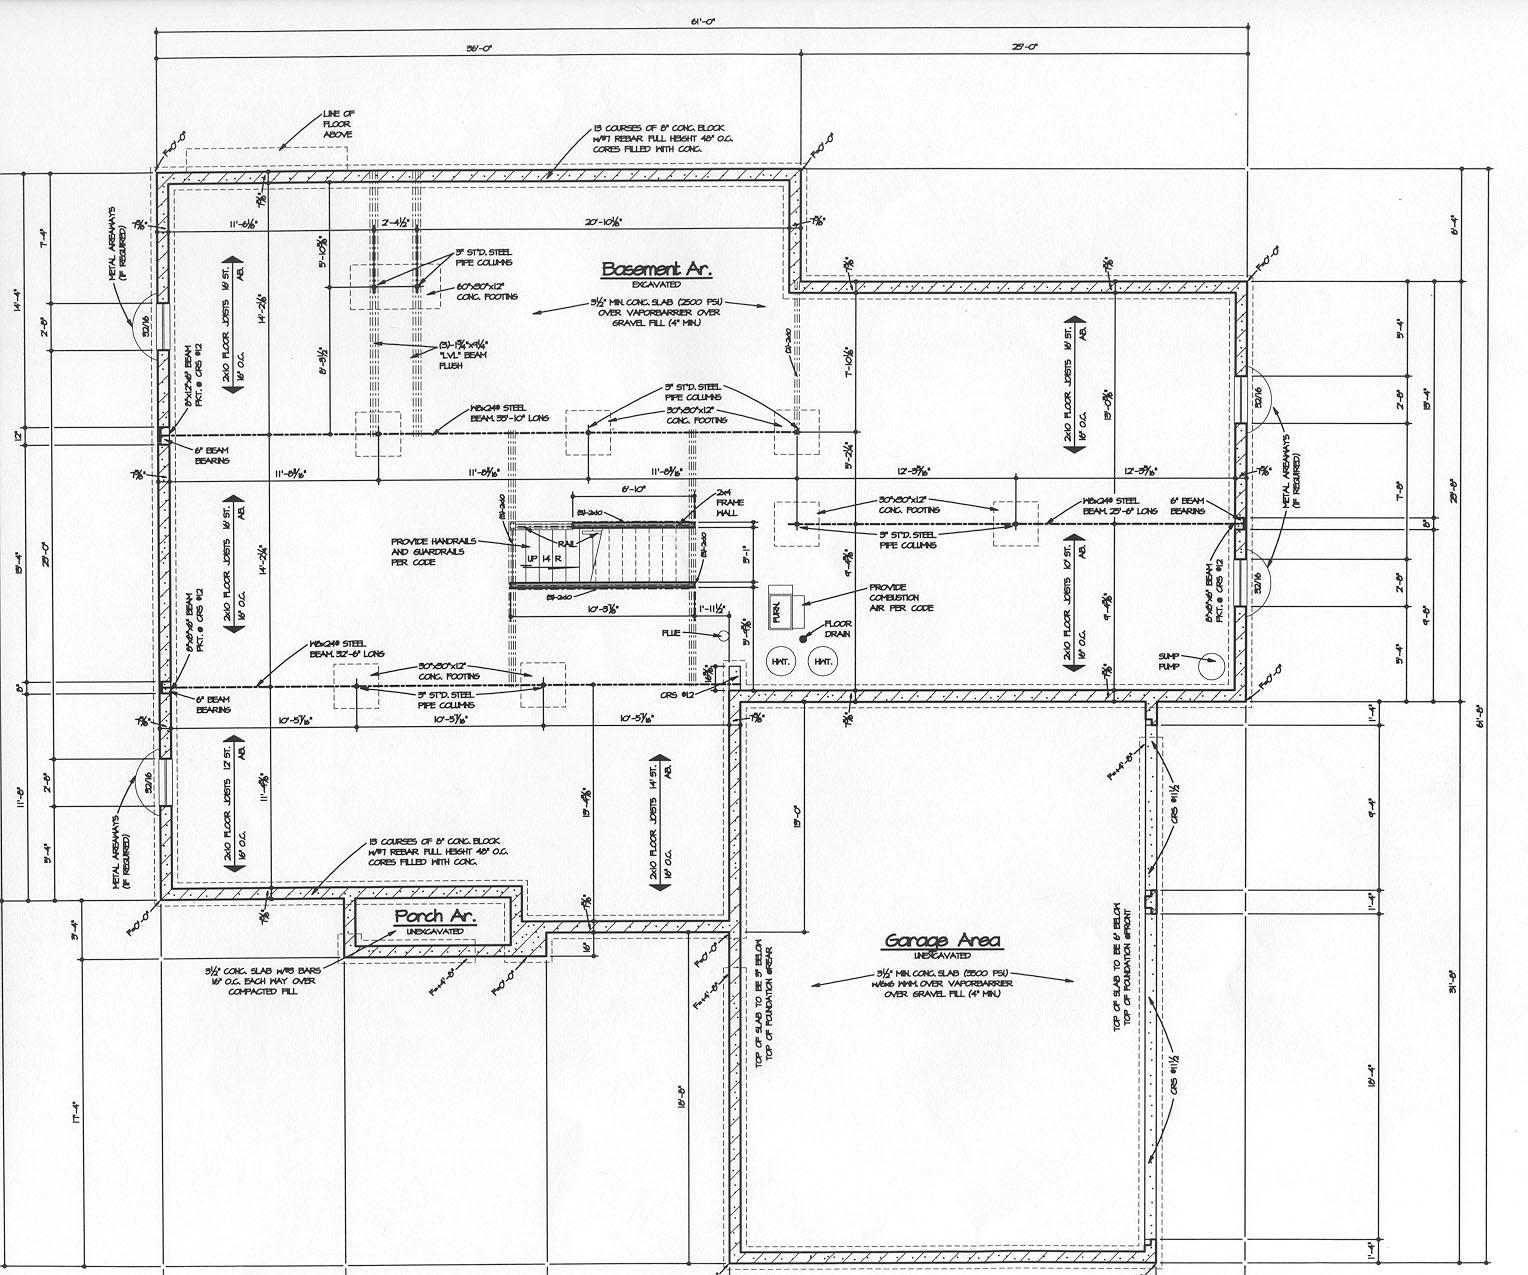 Blueprints for Foundation blueprints